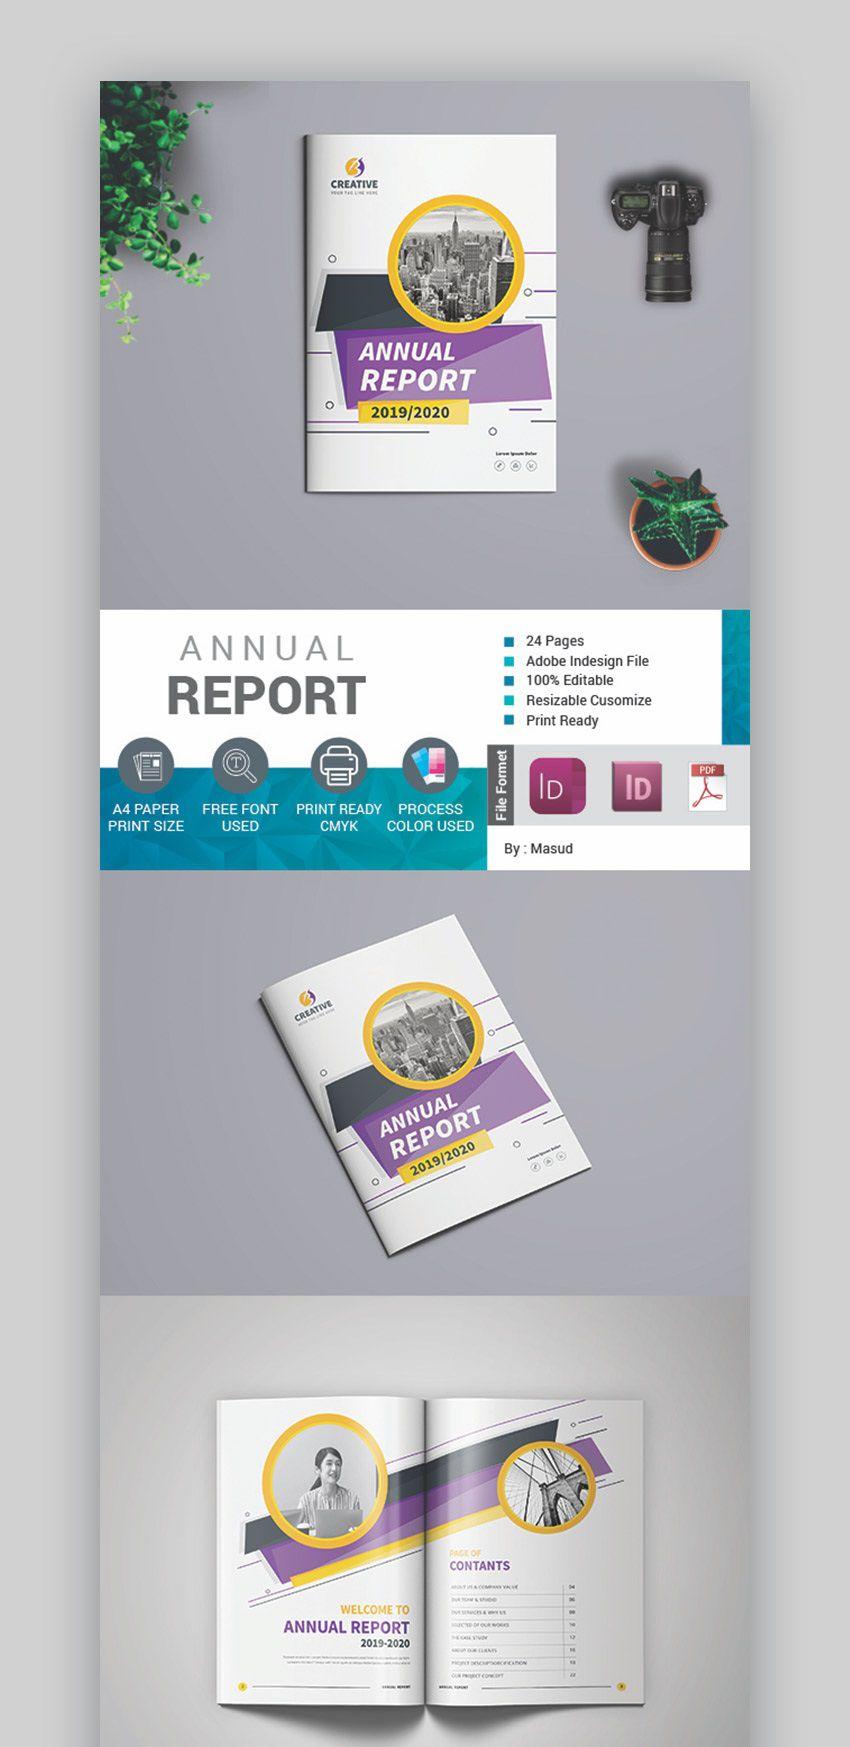 000 Stirring Free Annual Report Template Indesign Sample  Adobe Non ProfitFull